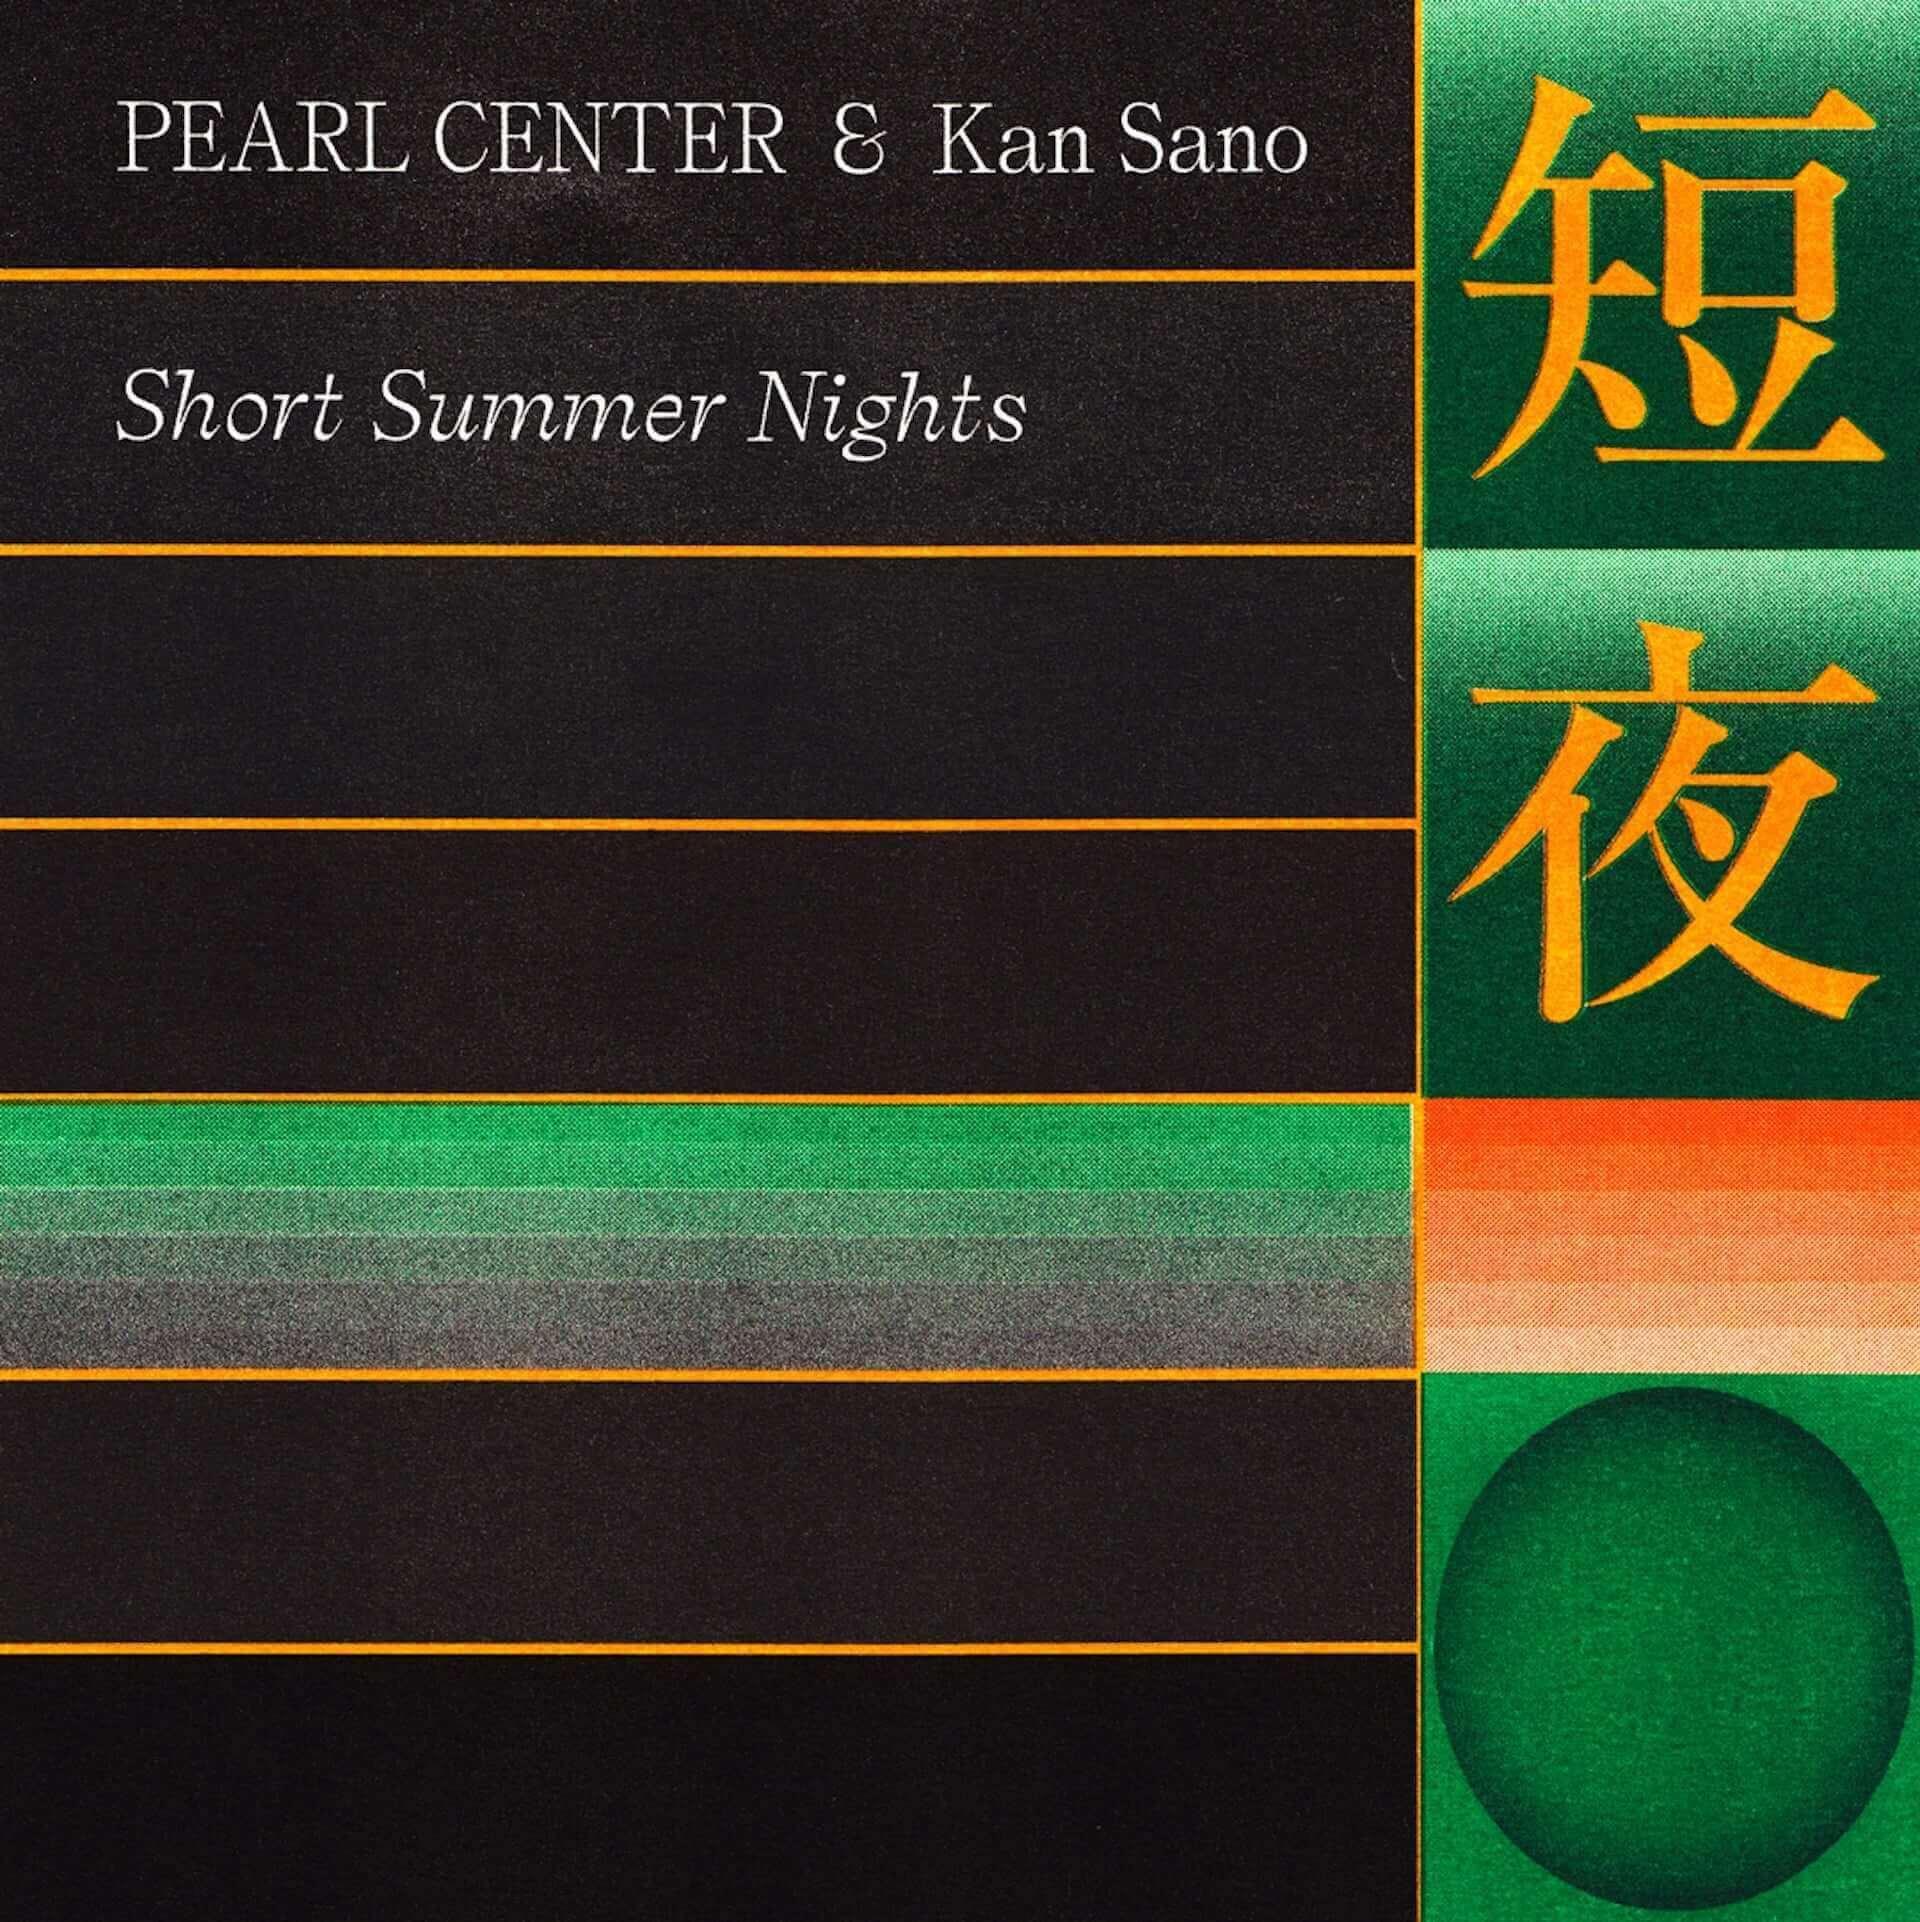 "PEARL CENTERとKan Sanoのコラボ曲""短夜""のリリックビデオが公開!縦型動画で魅せるビジュアル演出に注目 music200908_pearlcenter_2-1920x1922"